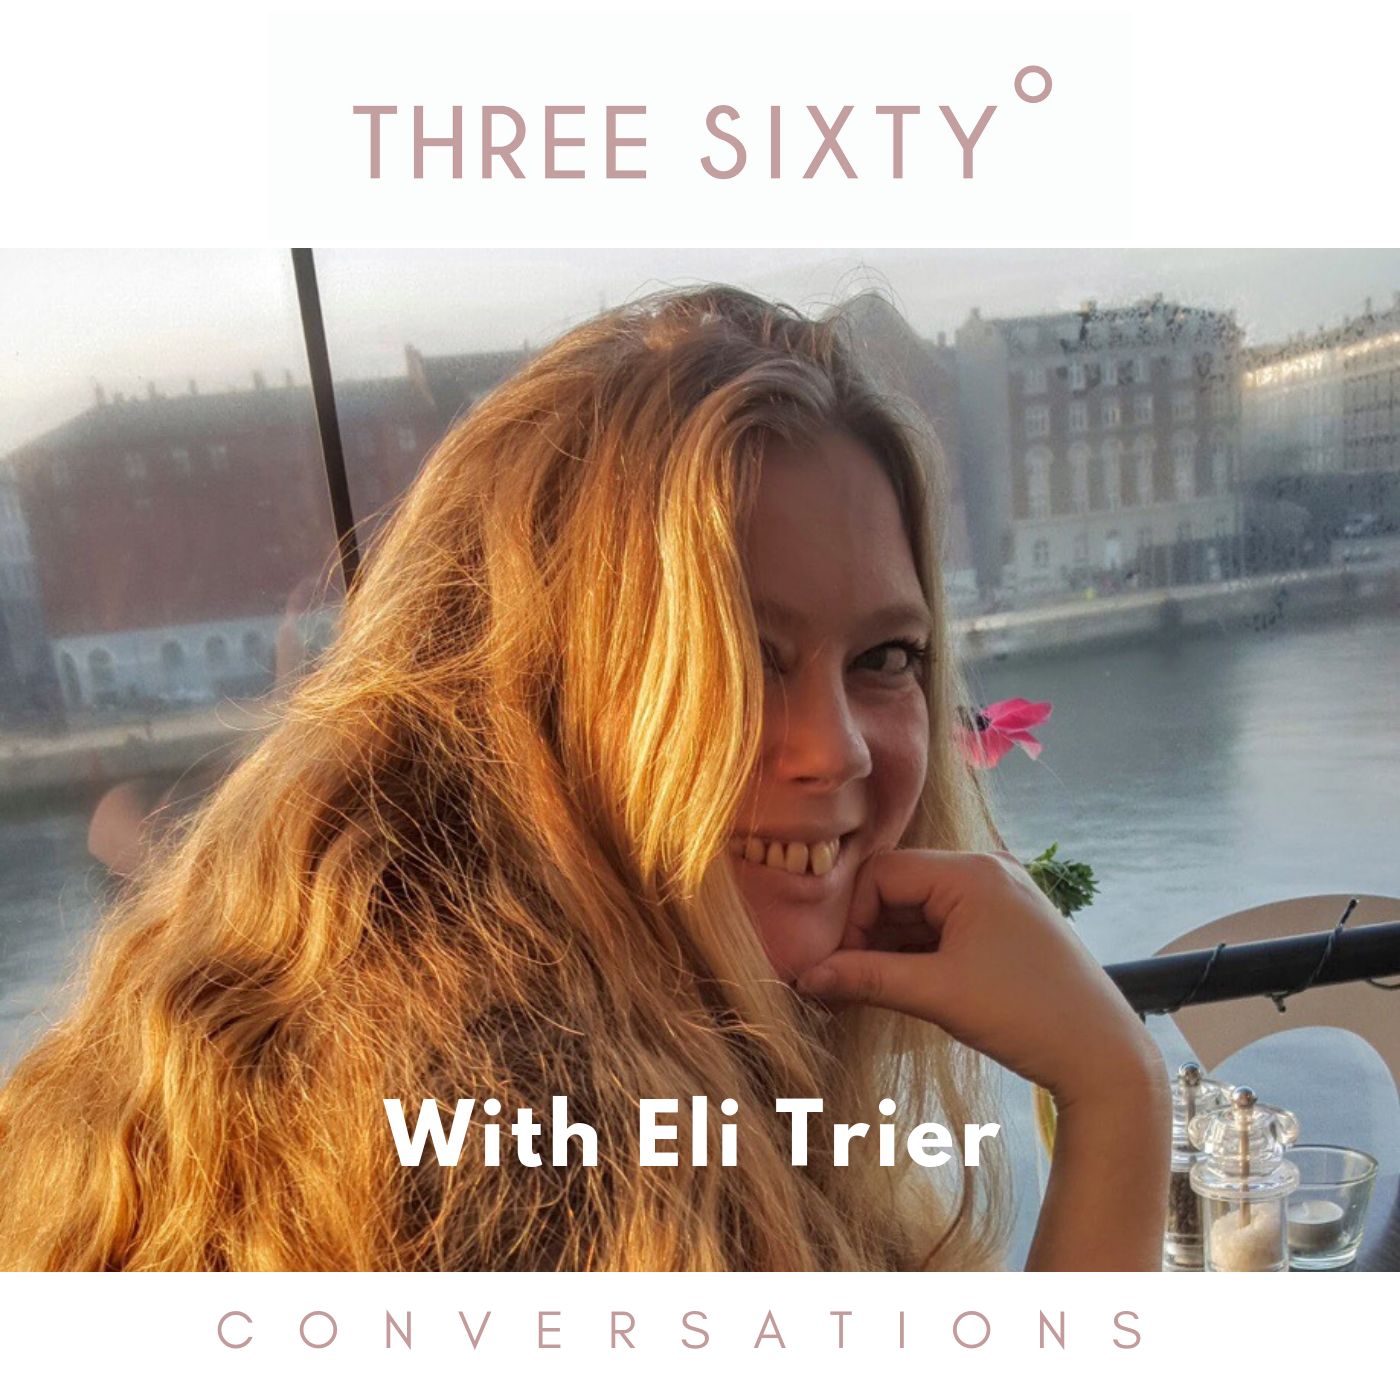 Eli trier, asd spectrum, introverted, quiet revolutionary